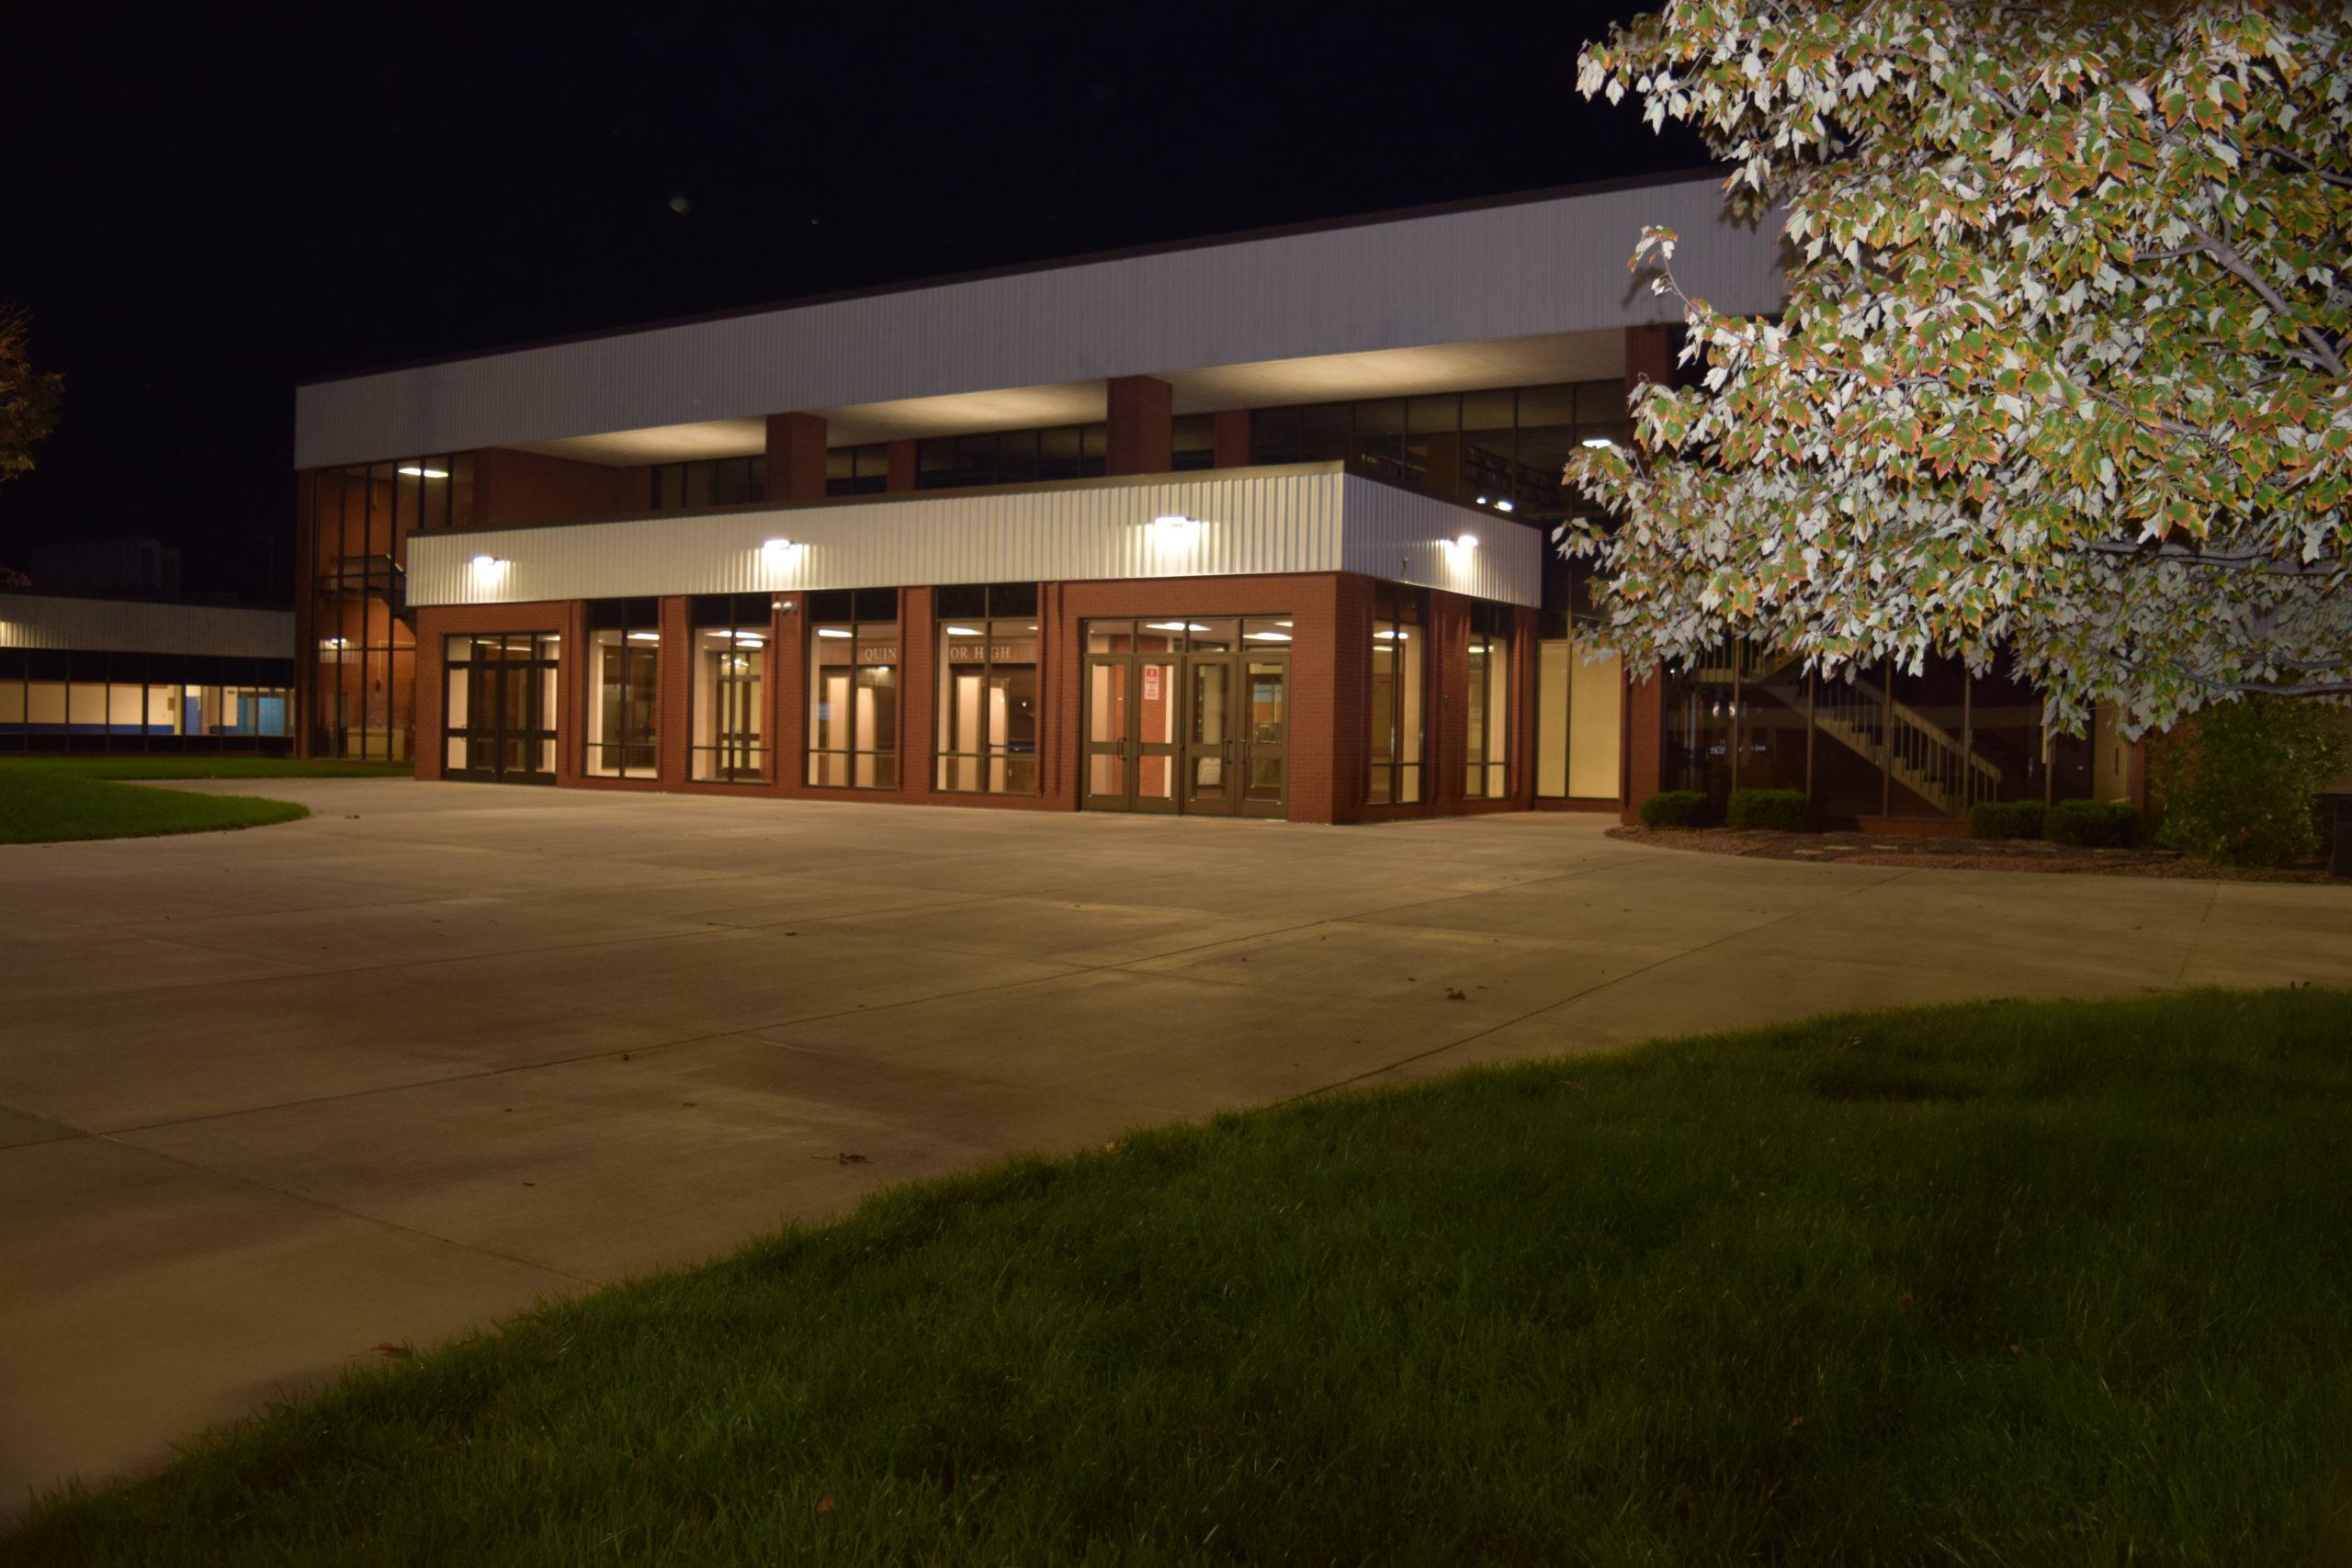 Quincy Senior High at night